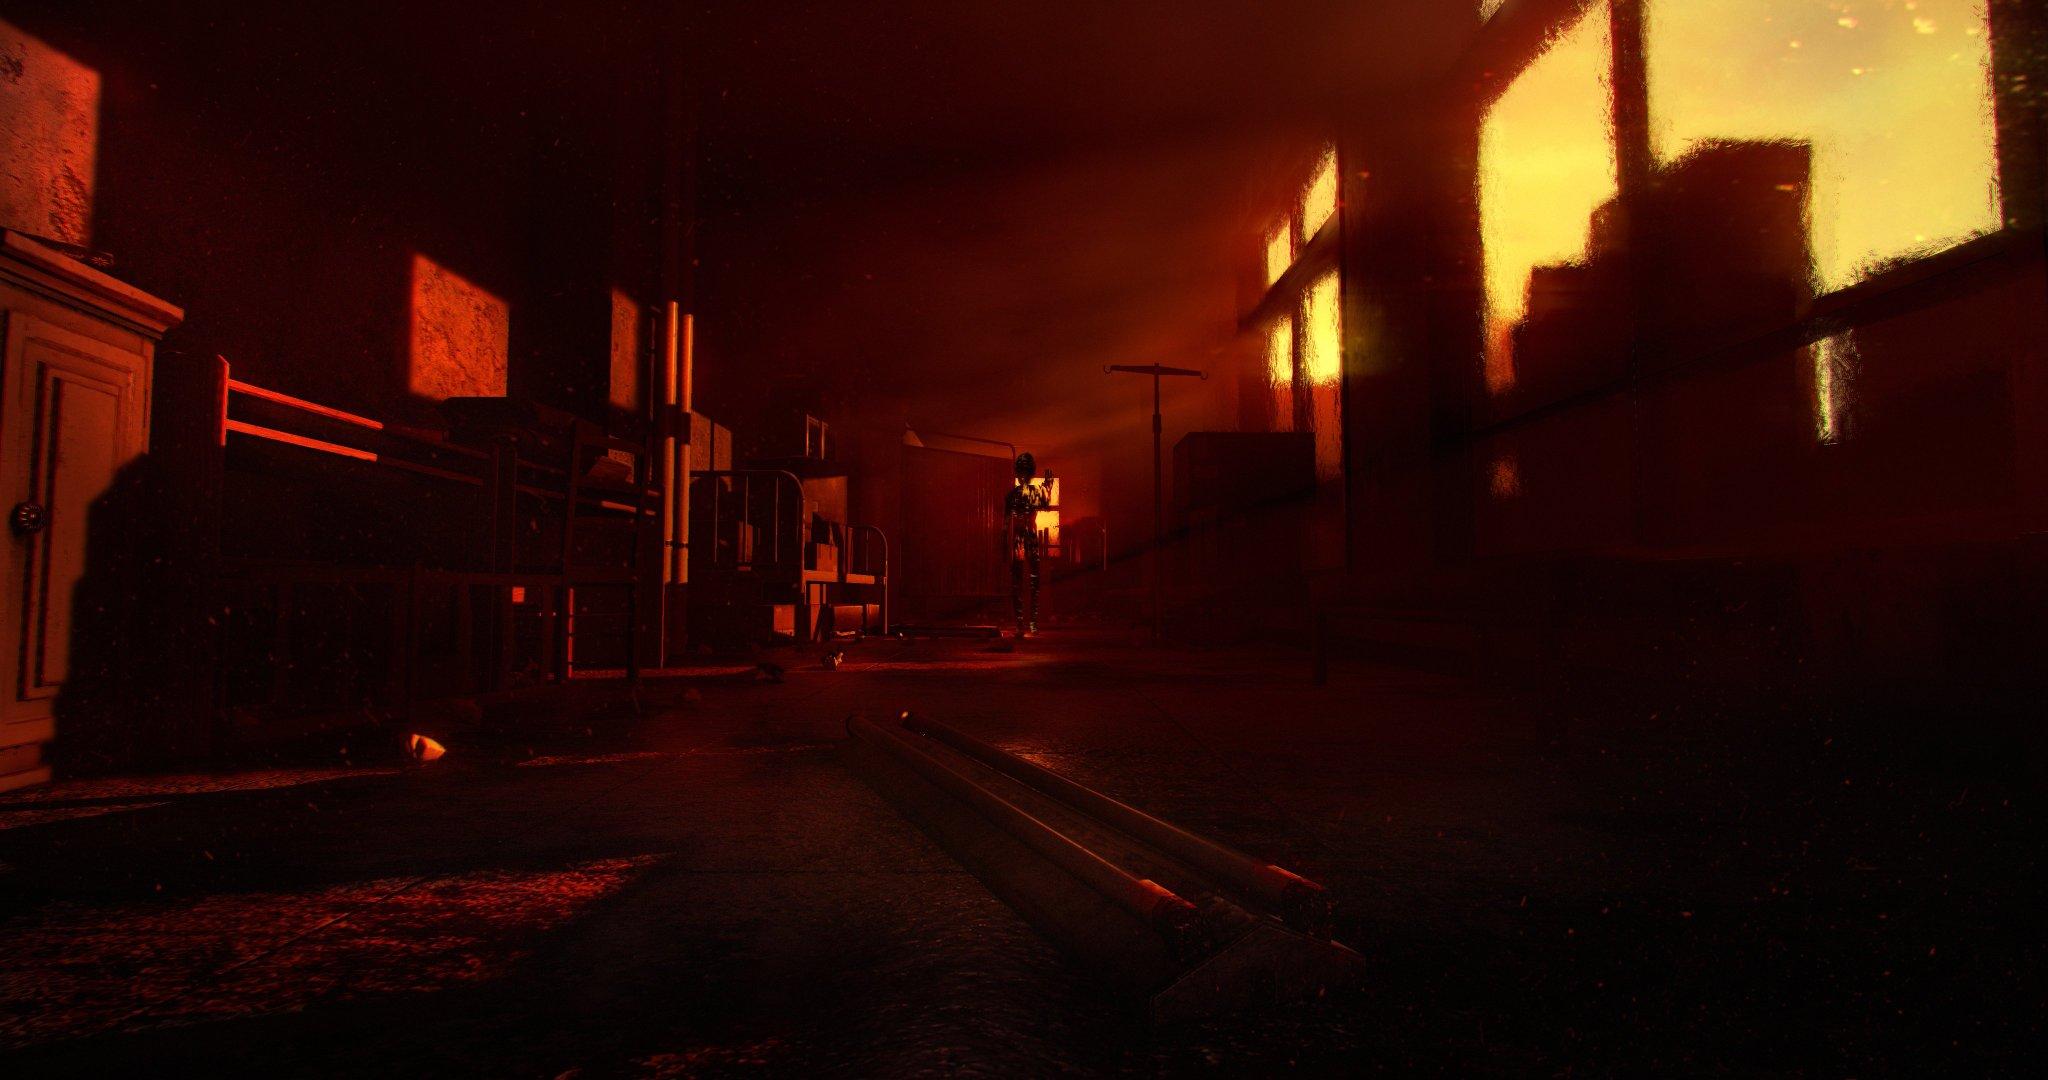 Tricore恐怖游戏新作 《夕鬼 Yuoni》公开